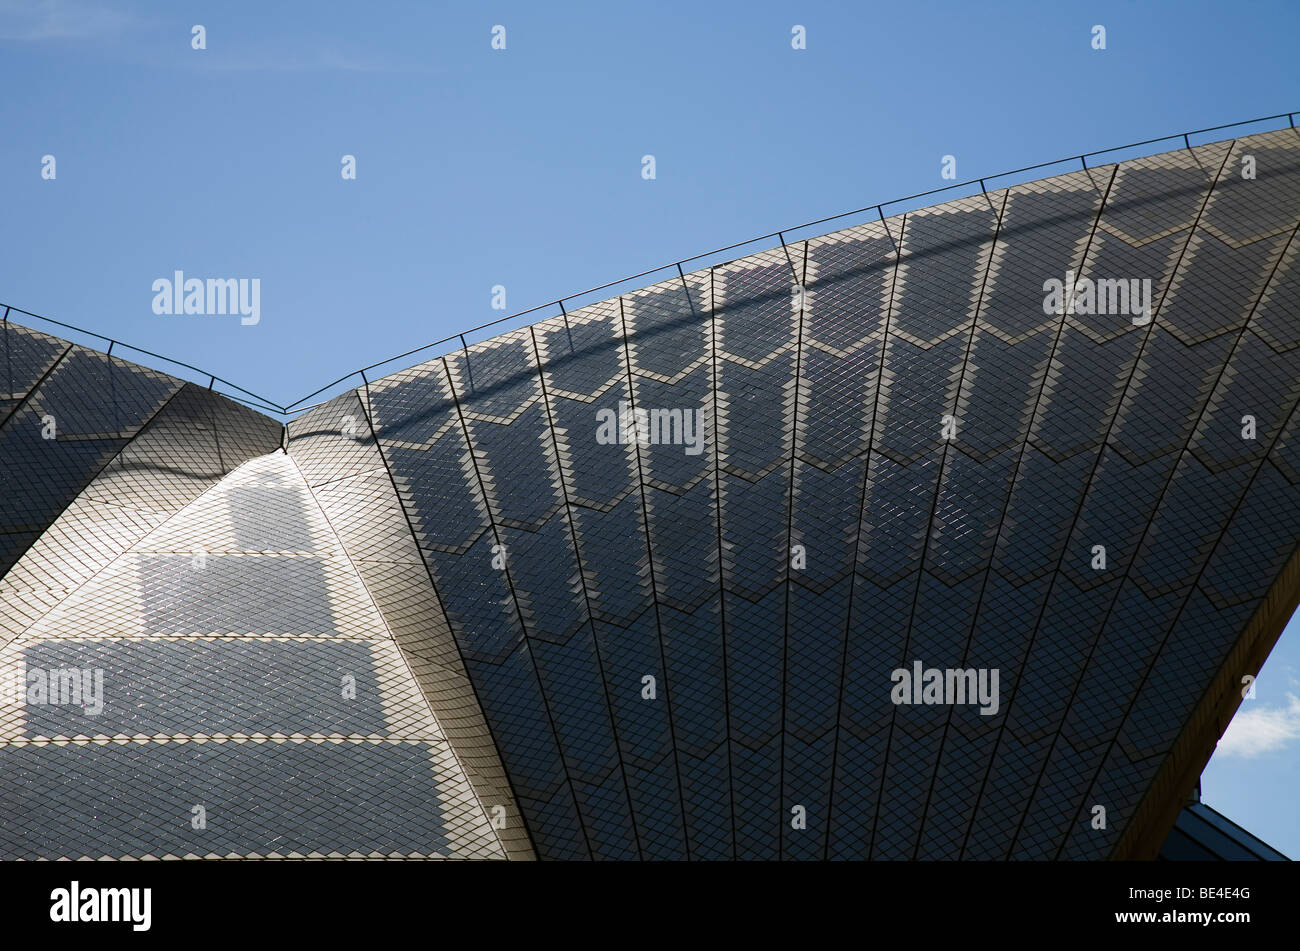 Sydney Opera House roof detail. Sydney, New South Wales, AUSTRALIA - Stock Image